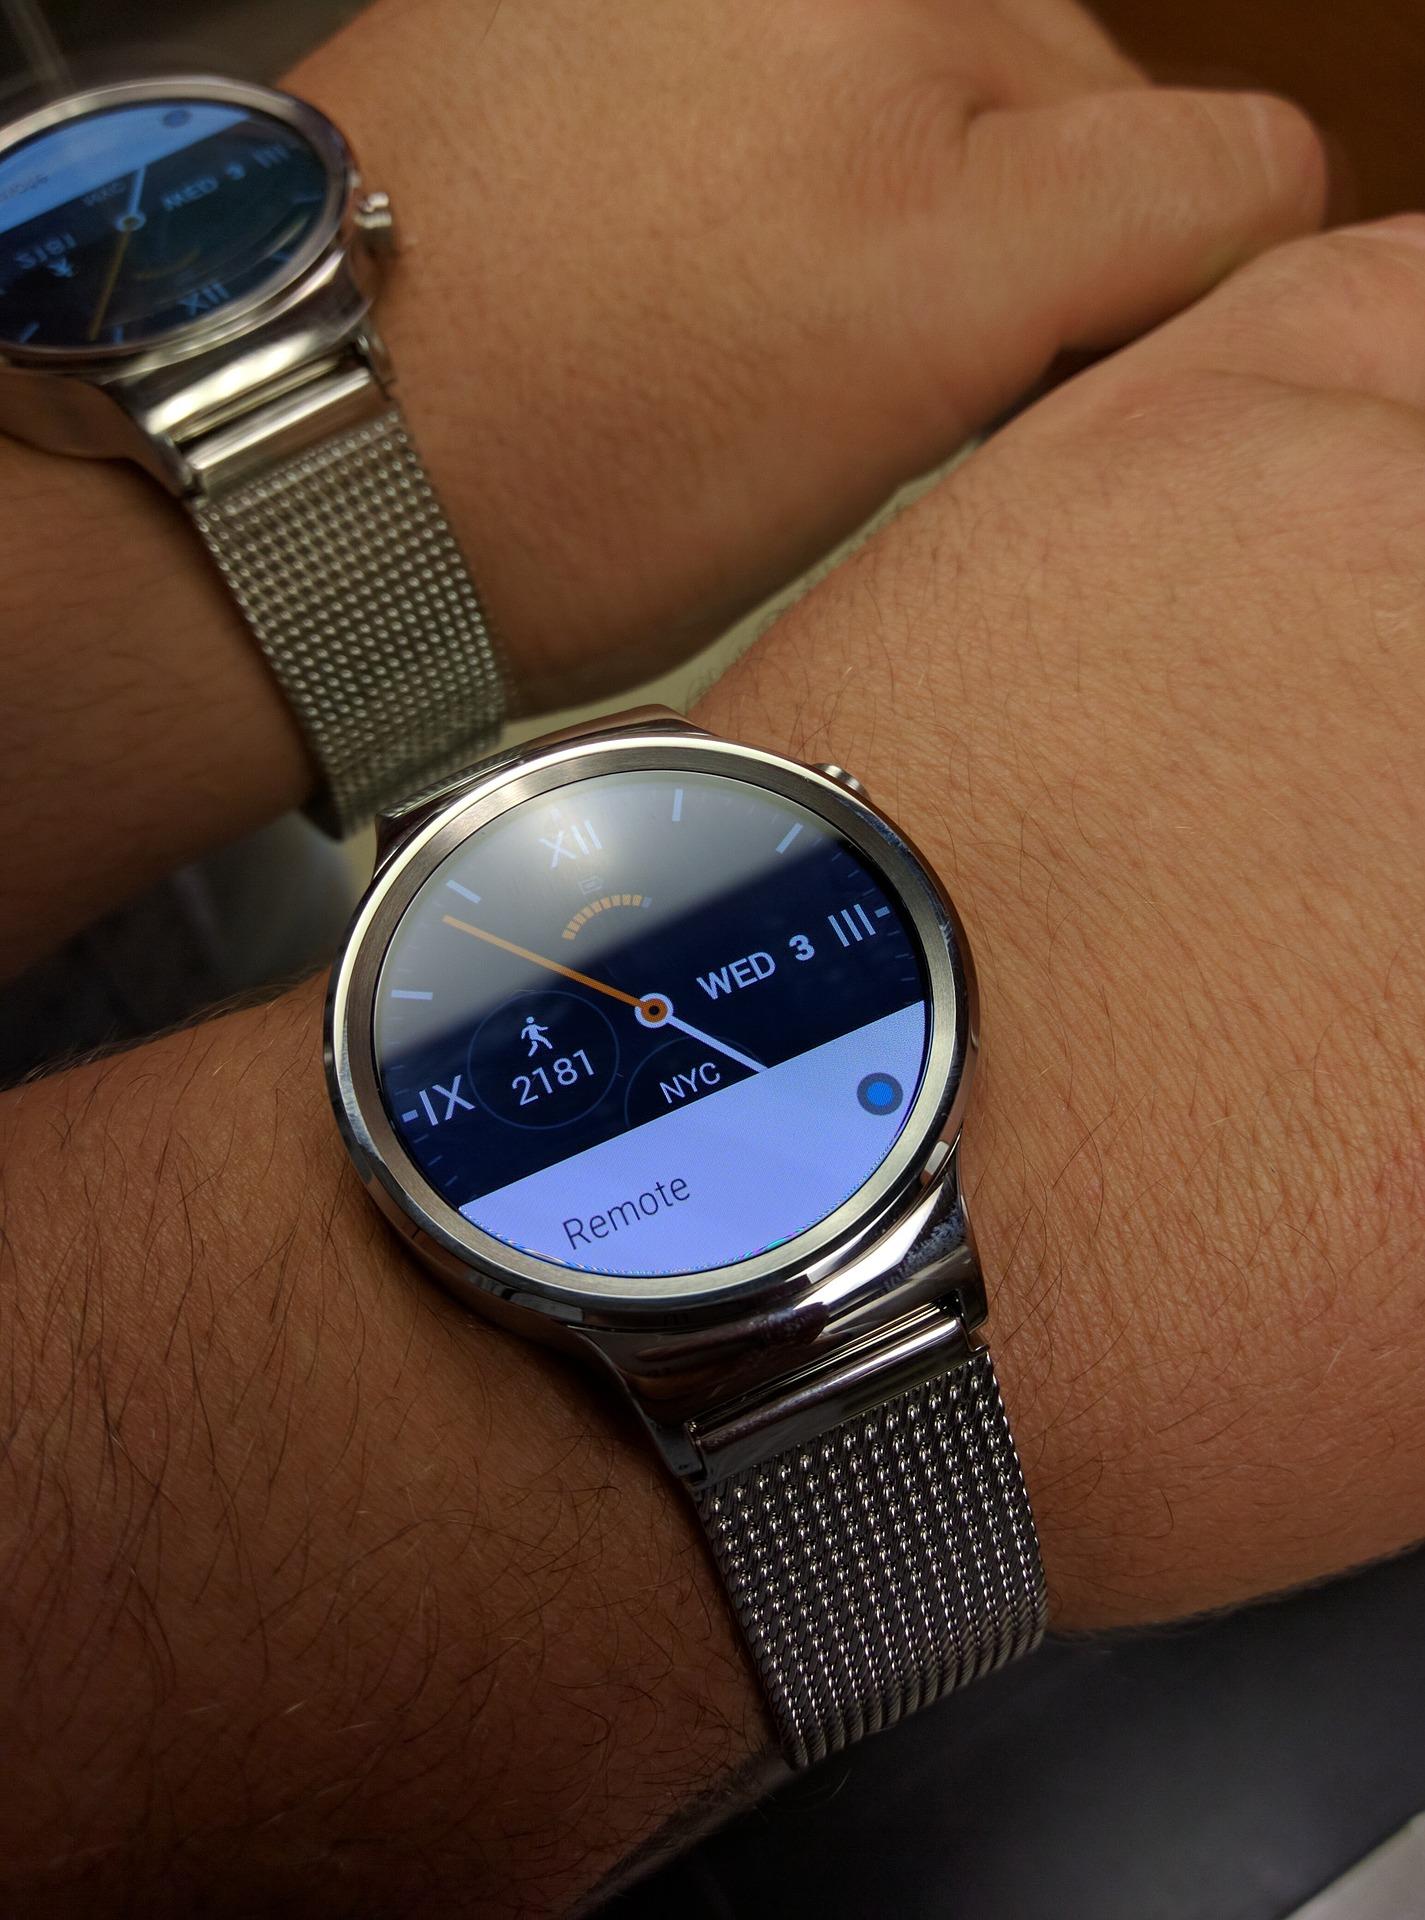 Huawei Watch.Courtesy: moldovancsaba, Pixabay